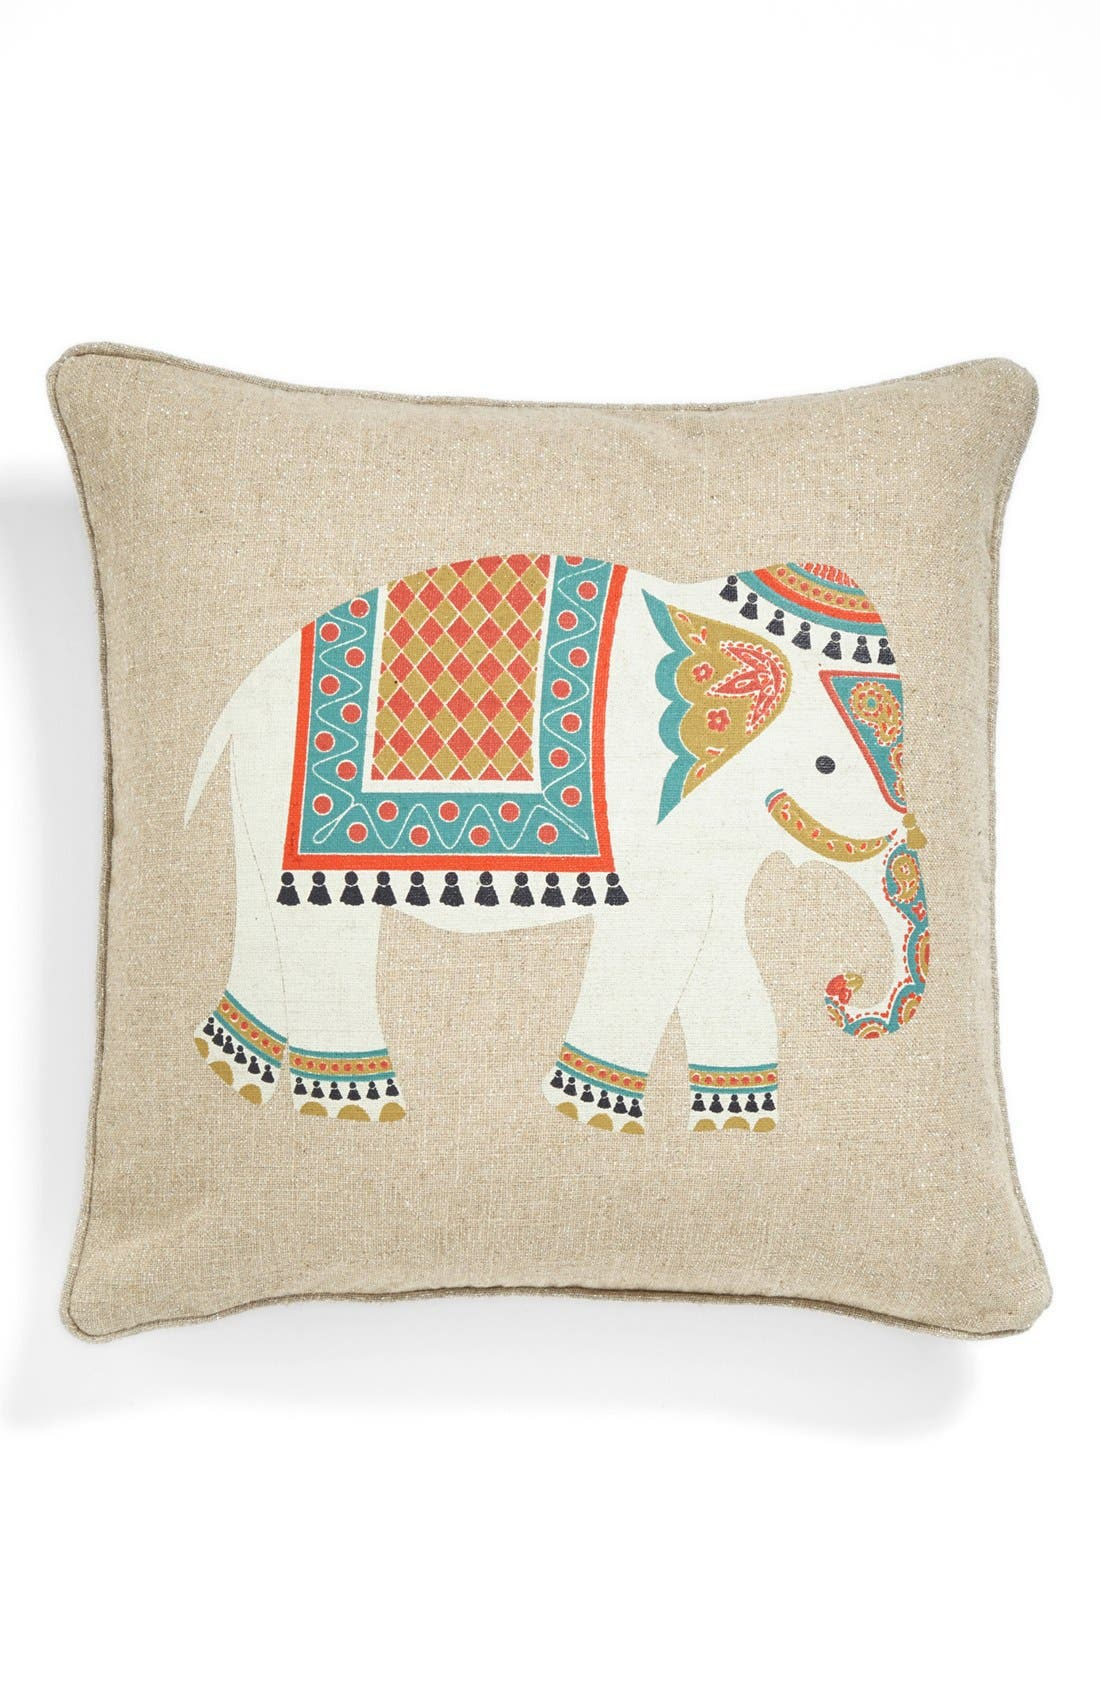 Alternate Image 1 Selected - Levtex 'Niko - Elephant' Pillow